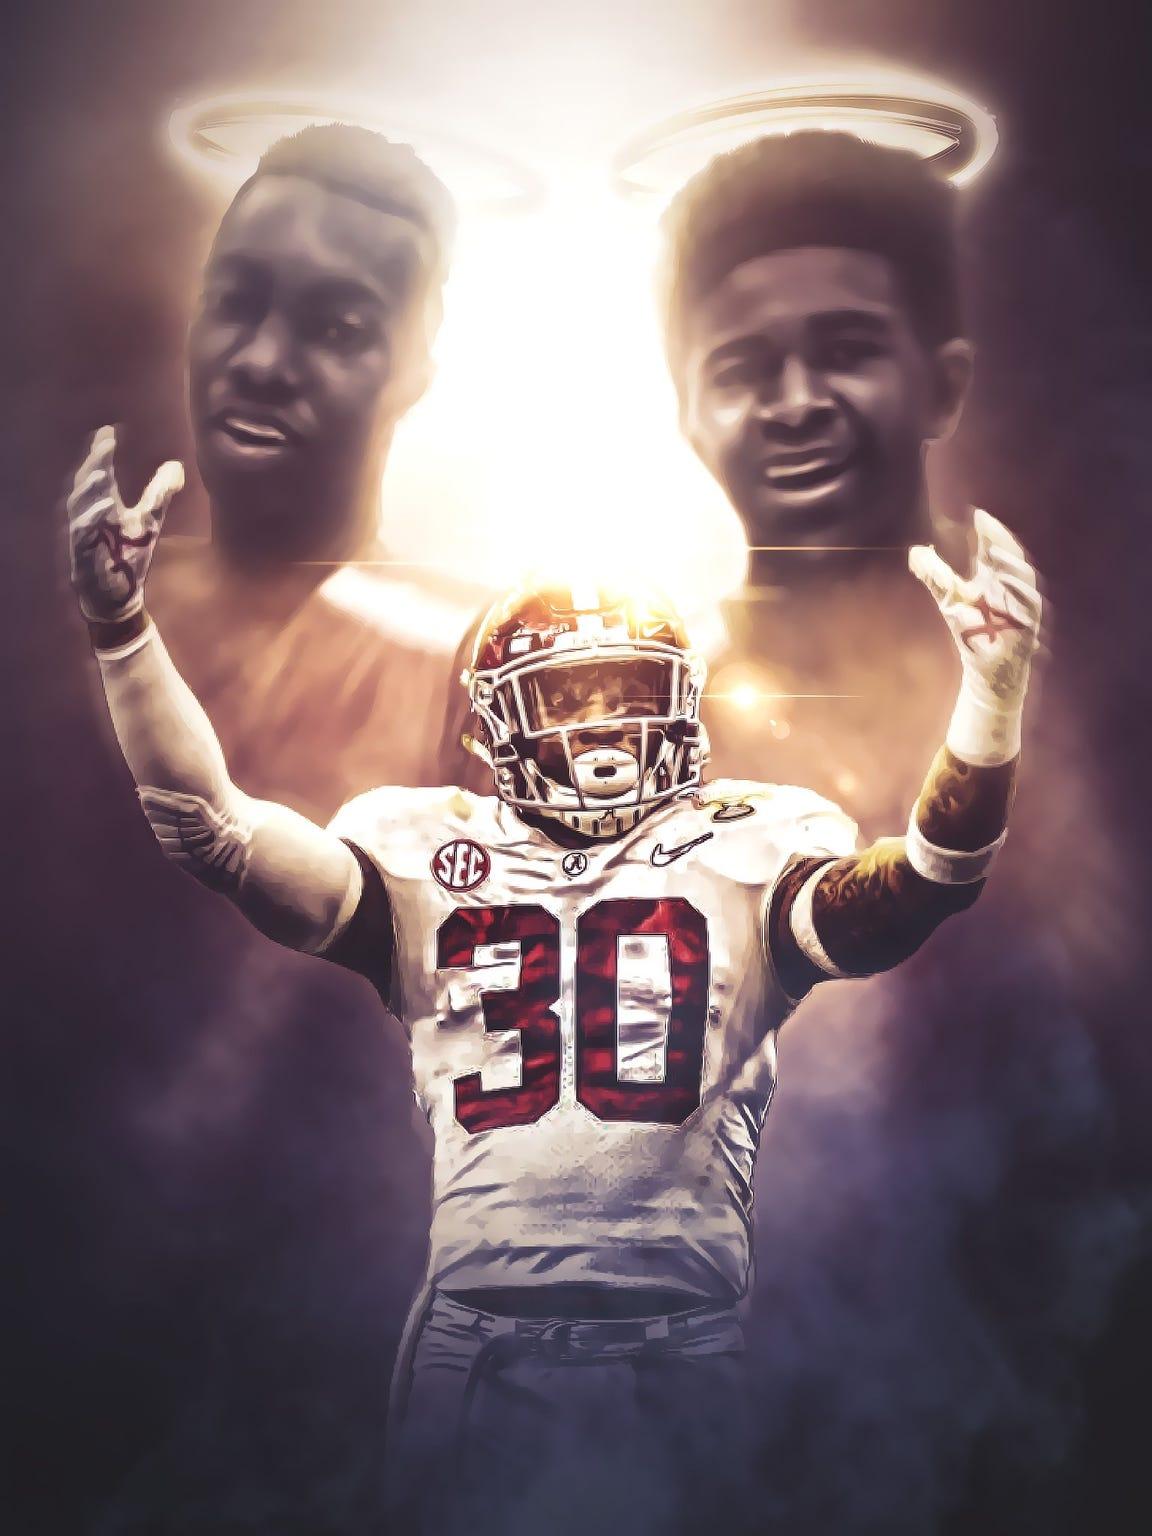 Randall Cotton created tribute to the memory of Rod Scott and Shaq Johnson for Alabama junior Mack Wilson.